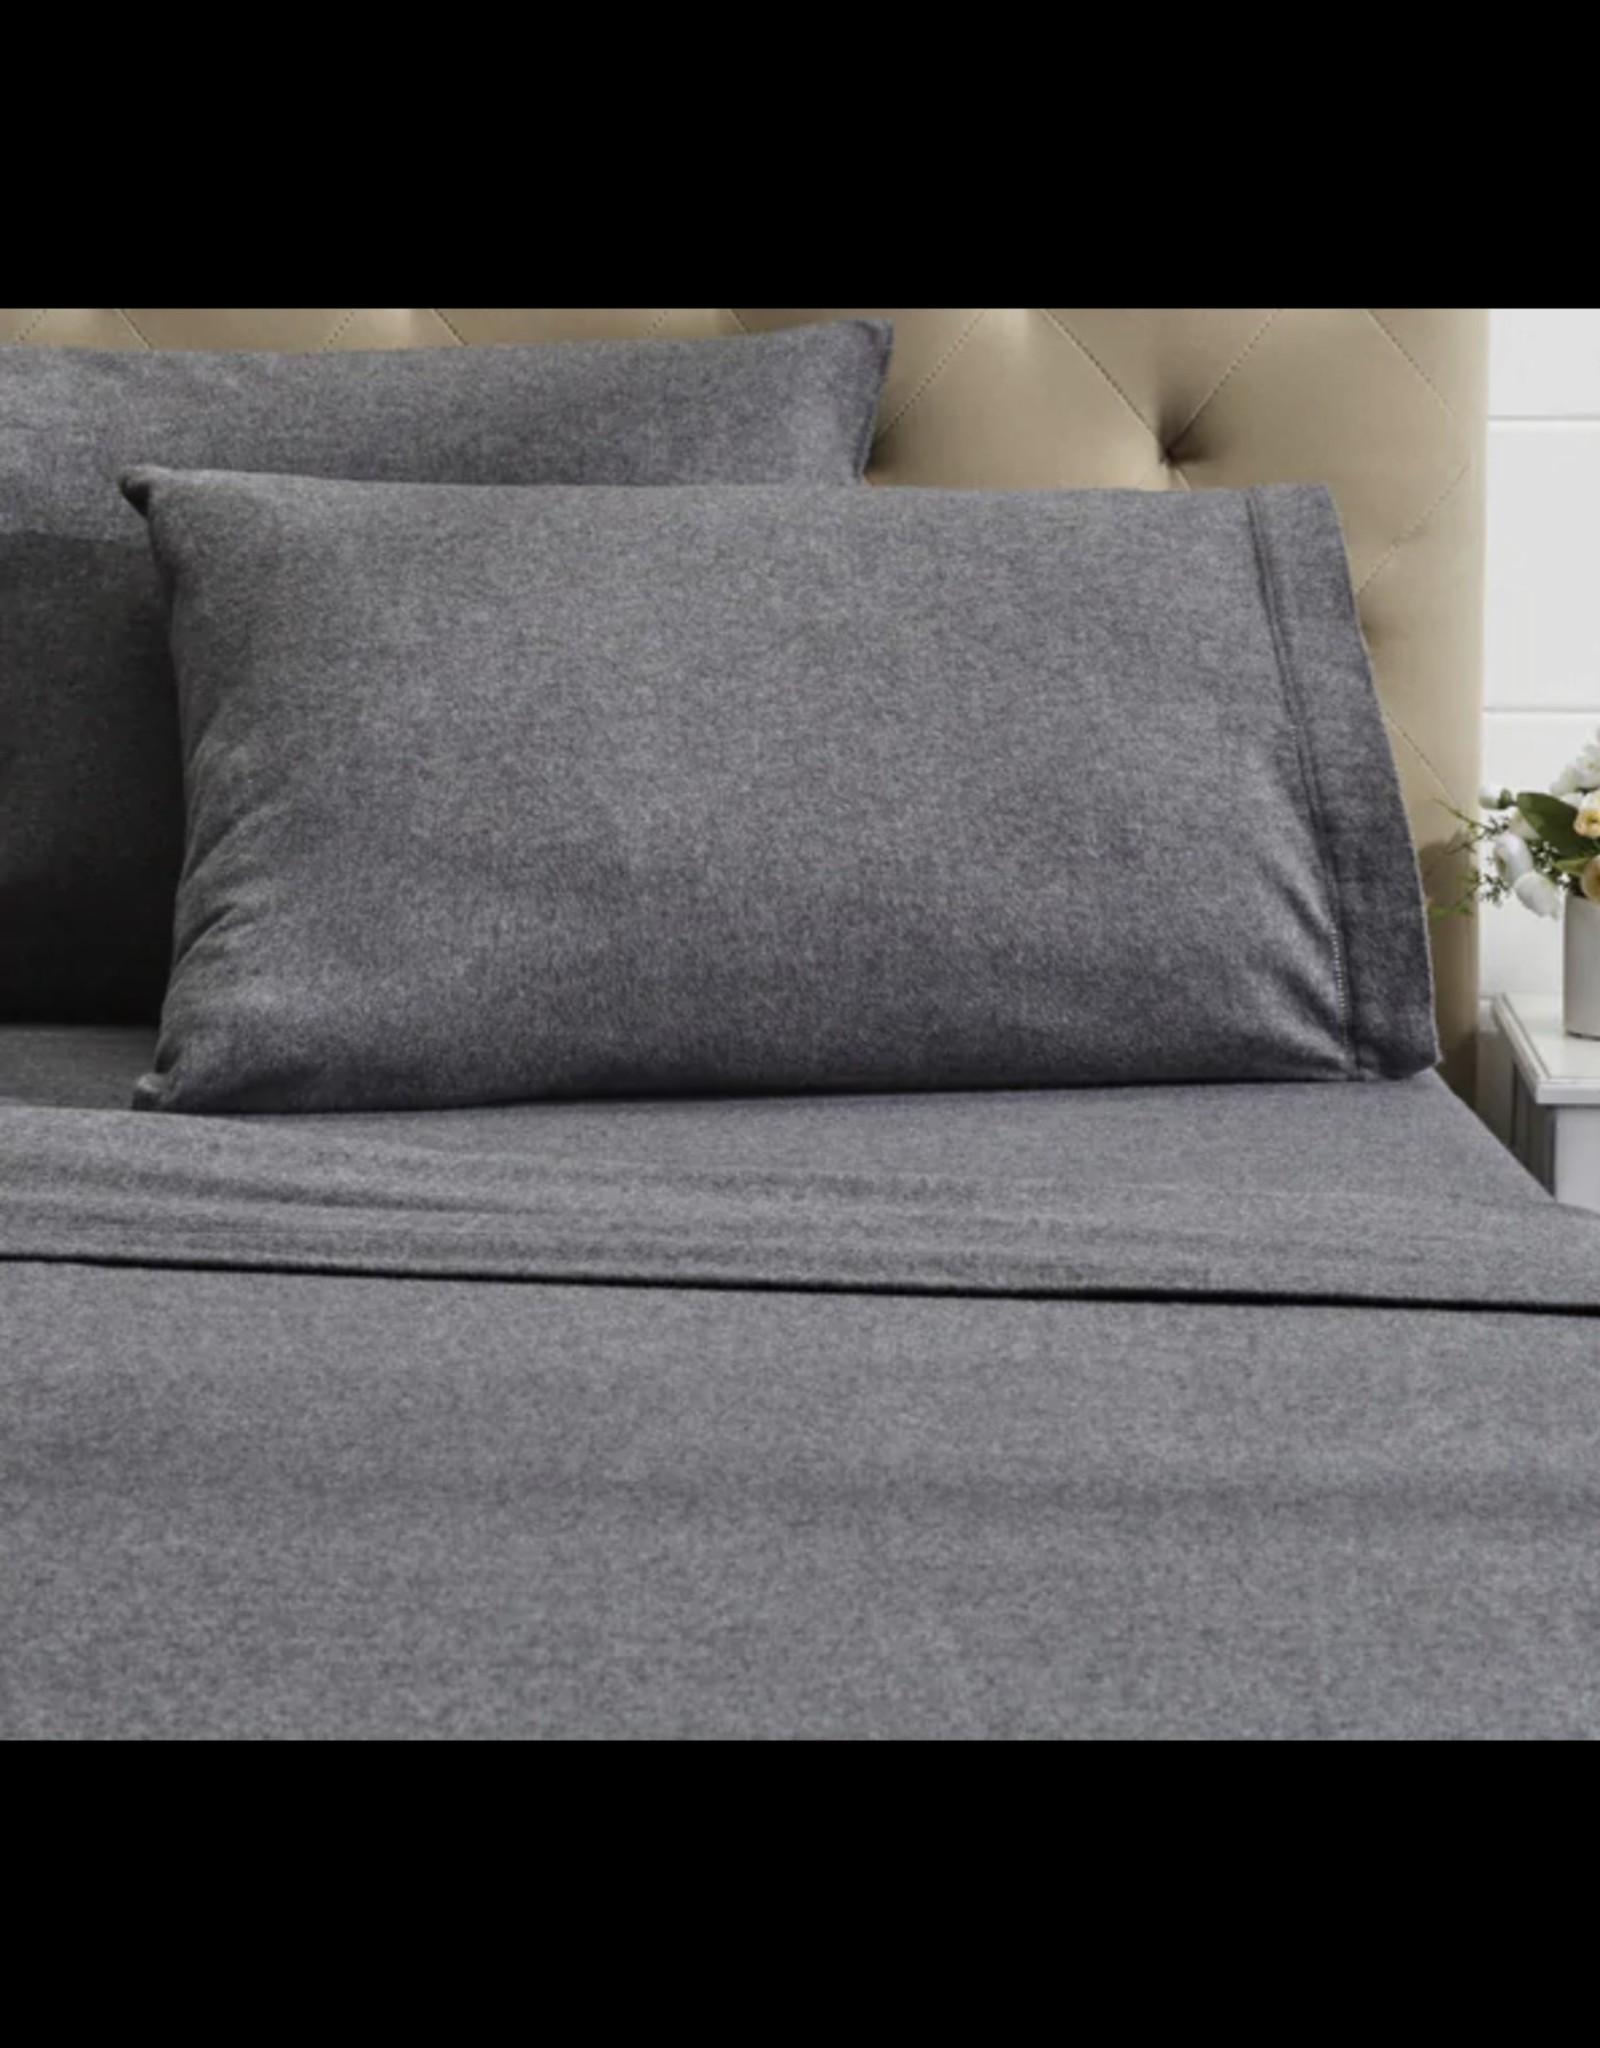 Intermark Sheets Dormisette Flannel King Grey Fitted